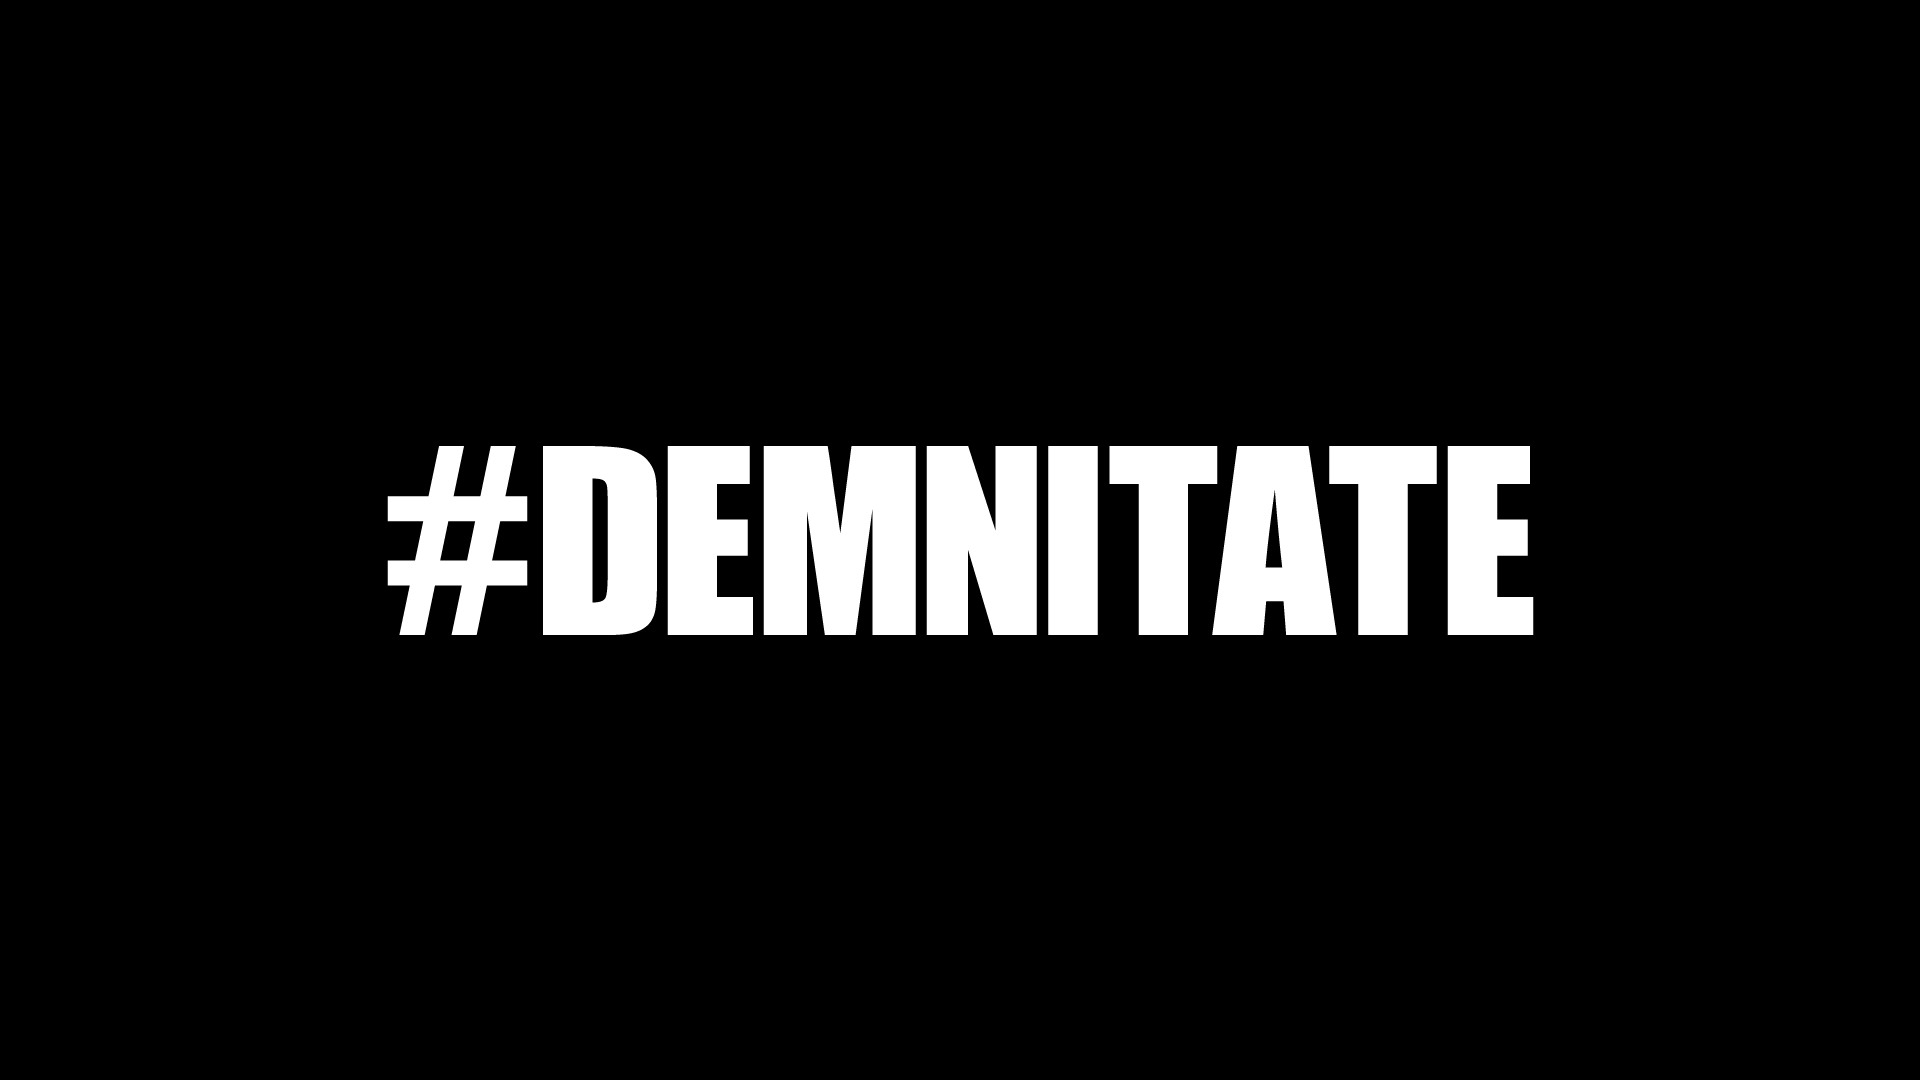 Parazitii feat Daniel Lazar – Demnitate (videoclip oficial)